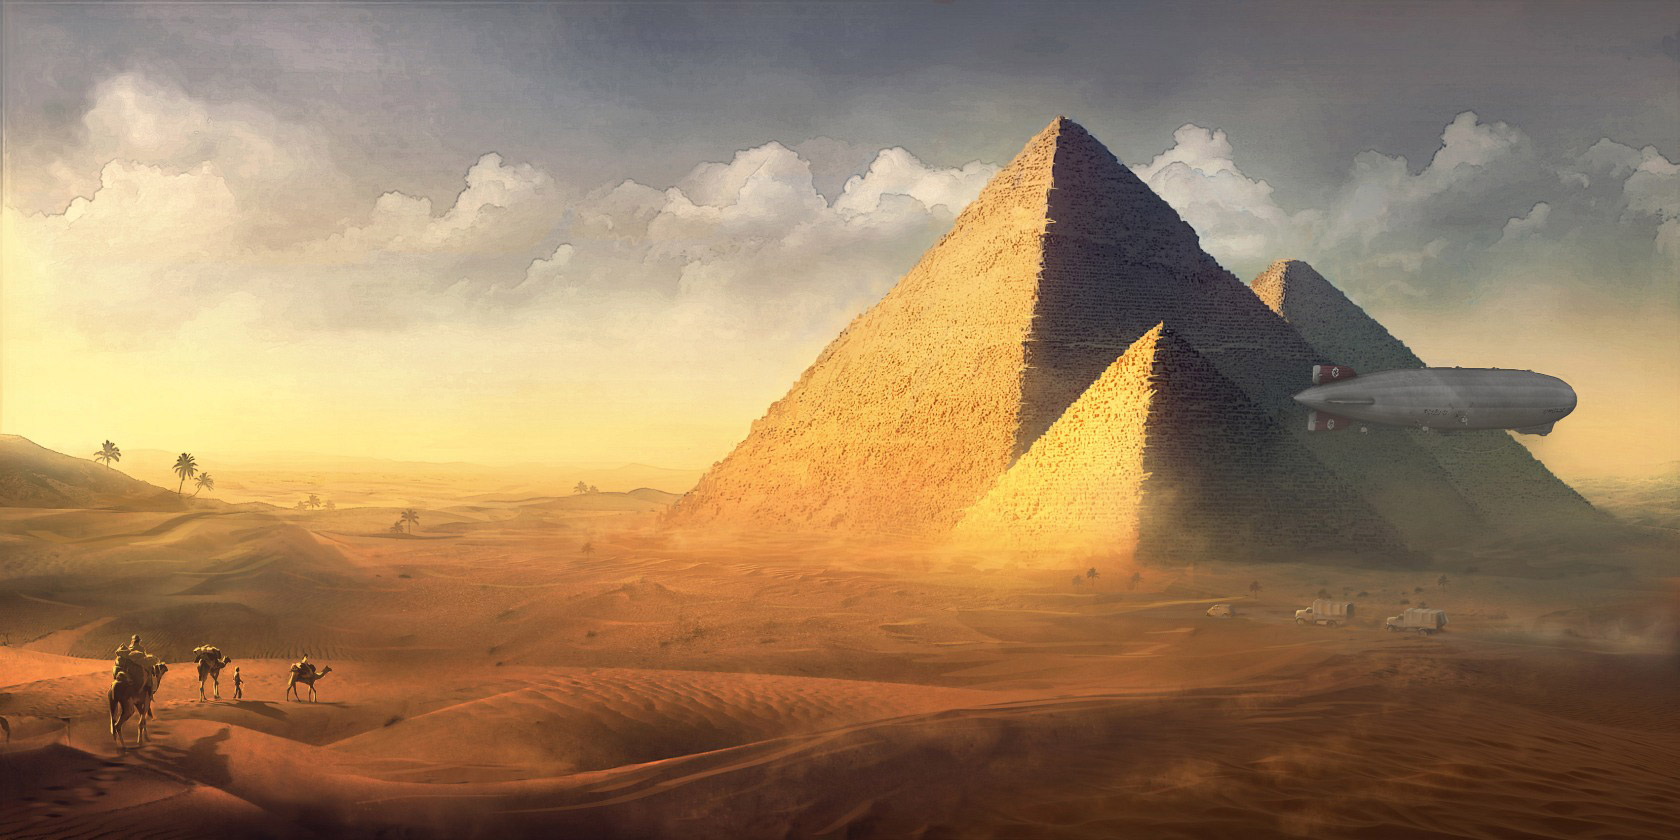 04._egypt_giza.1362085899.jpg